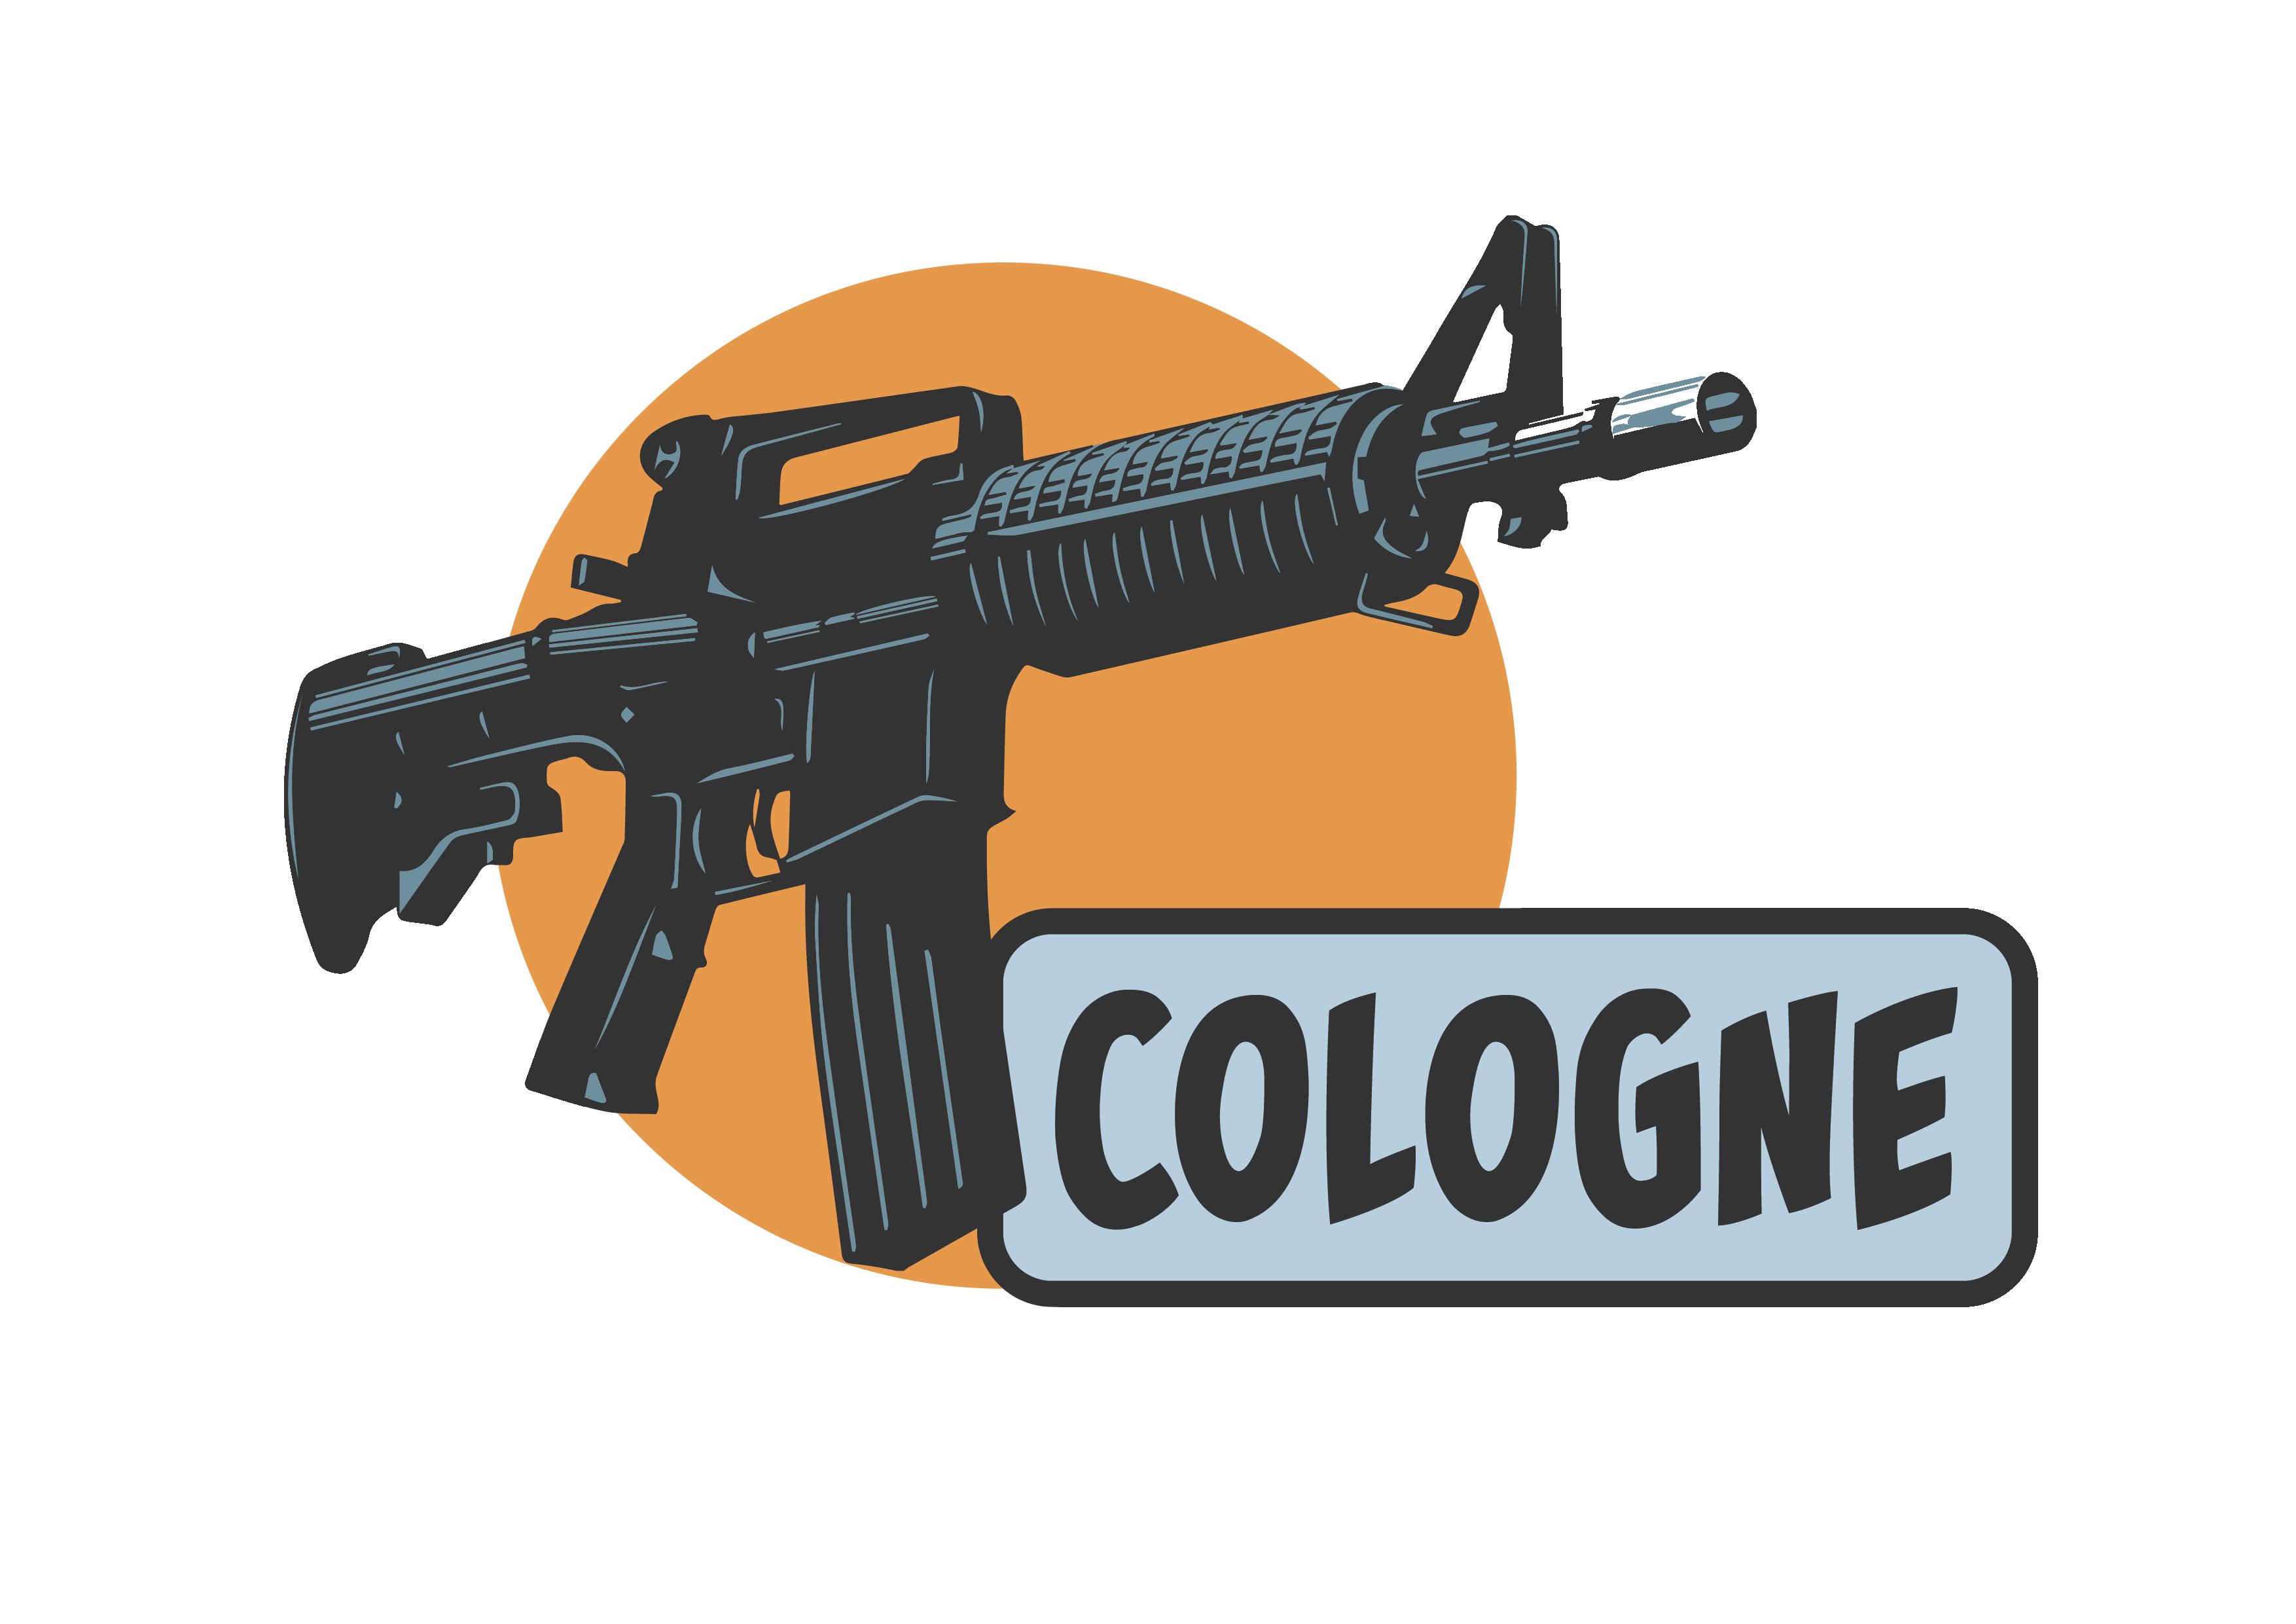 Cologne-01